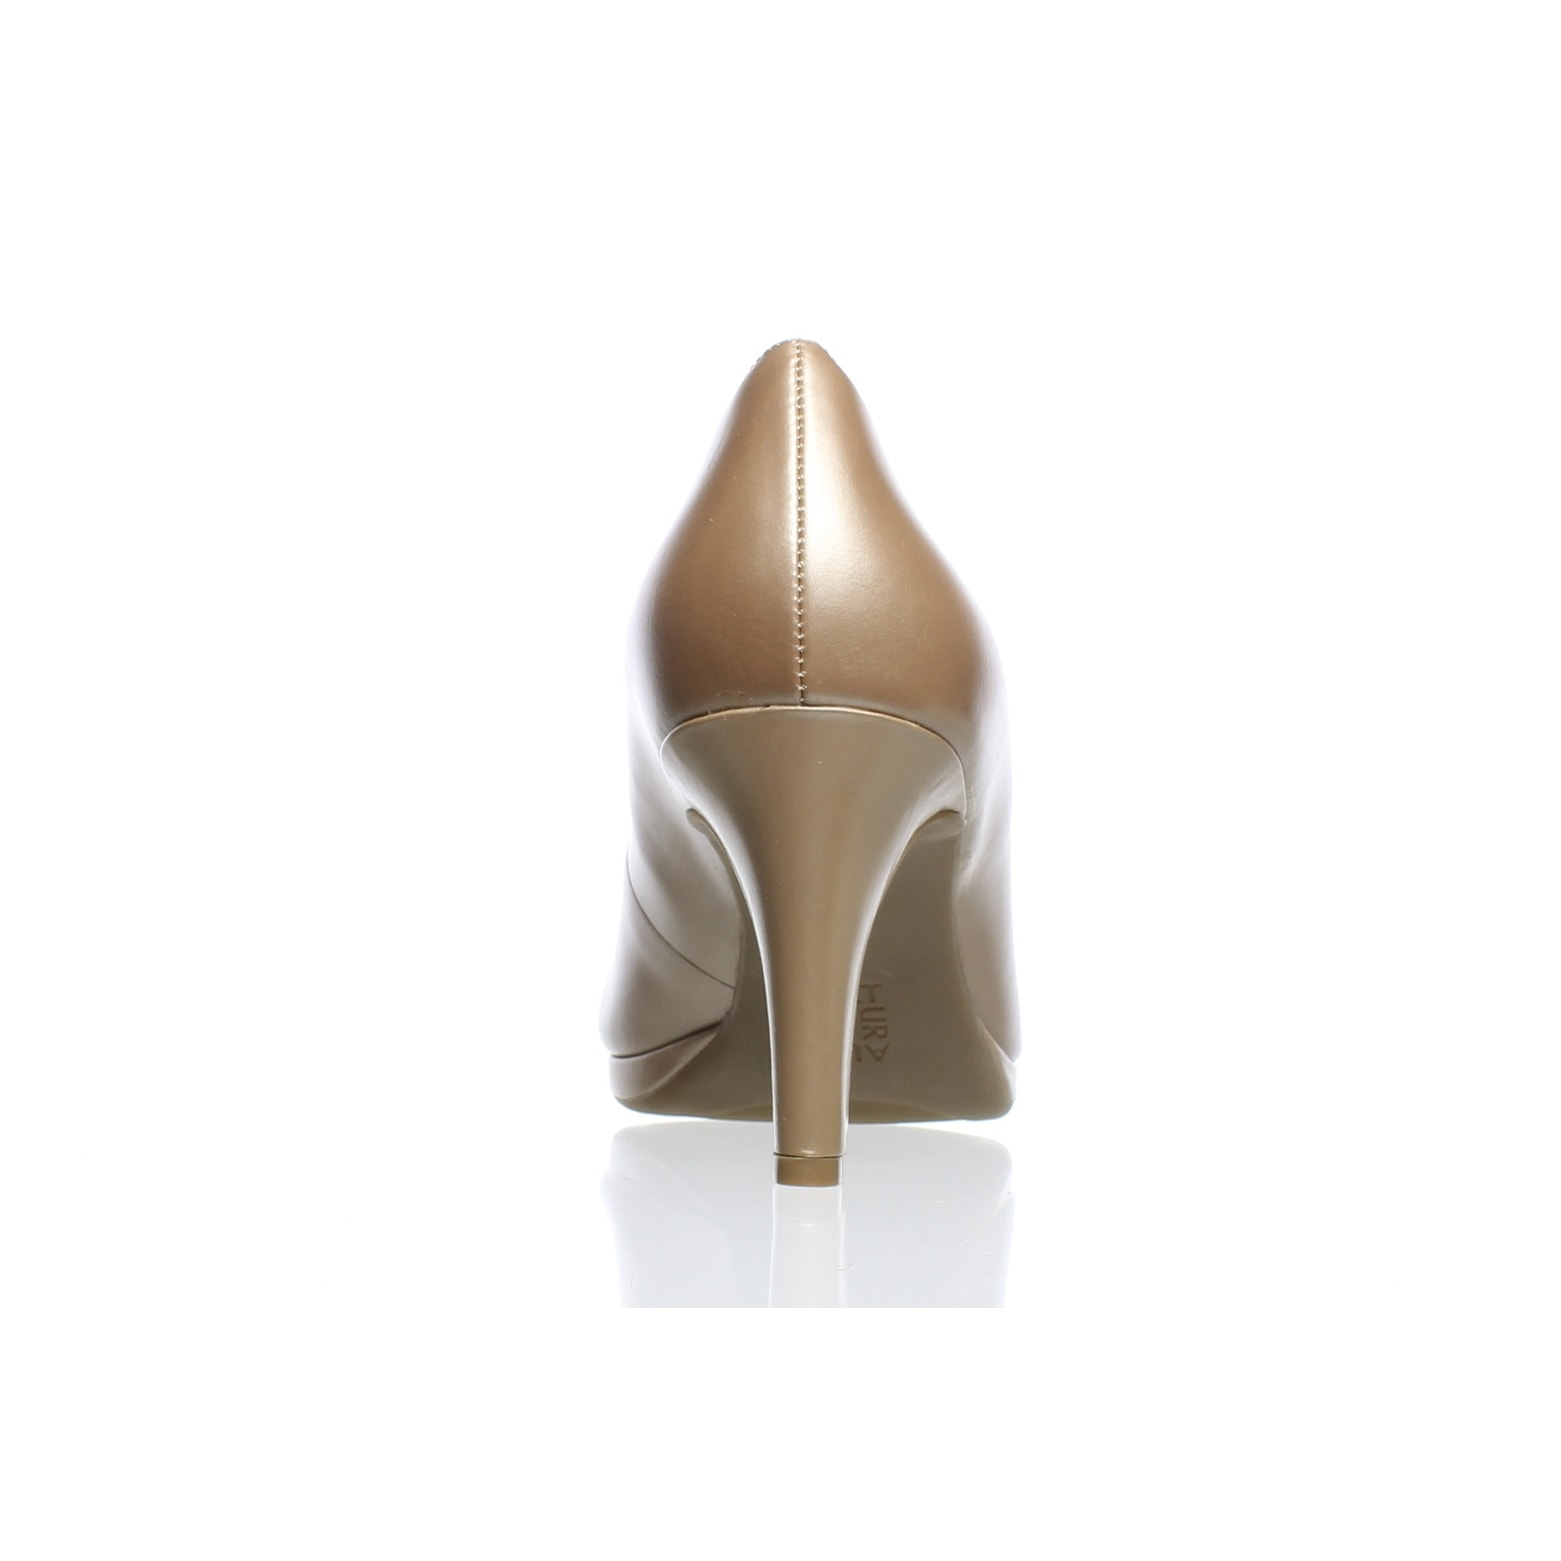 9ef981e62d1 Naturalizer Womens Michelle Chai Pumps Size 8 (2E)